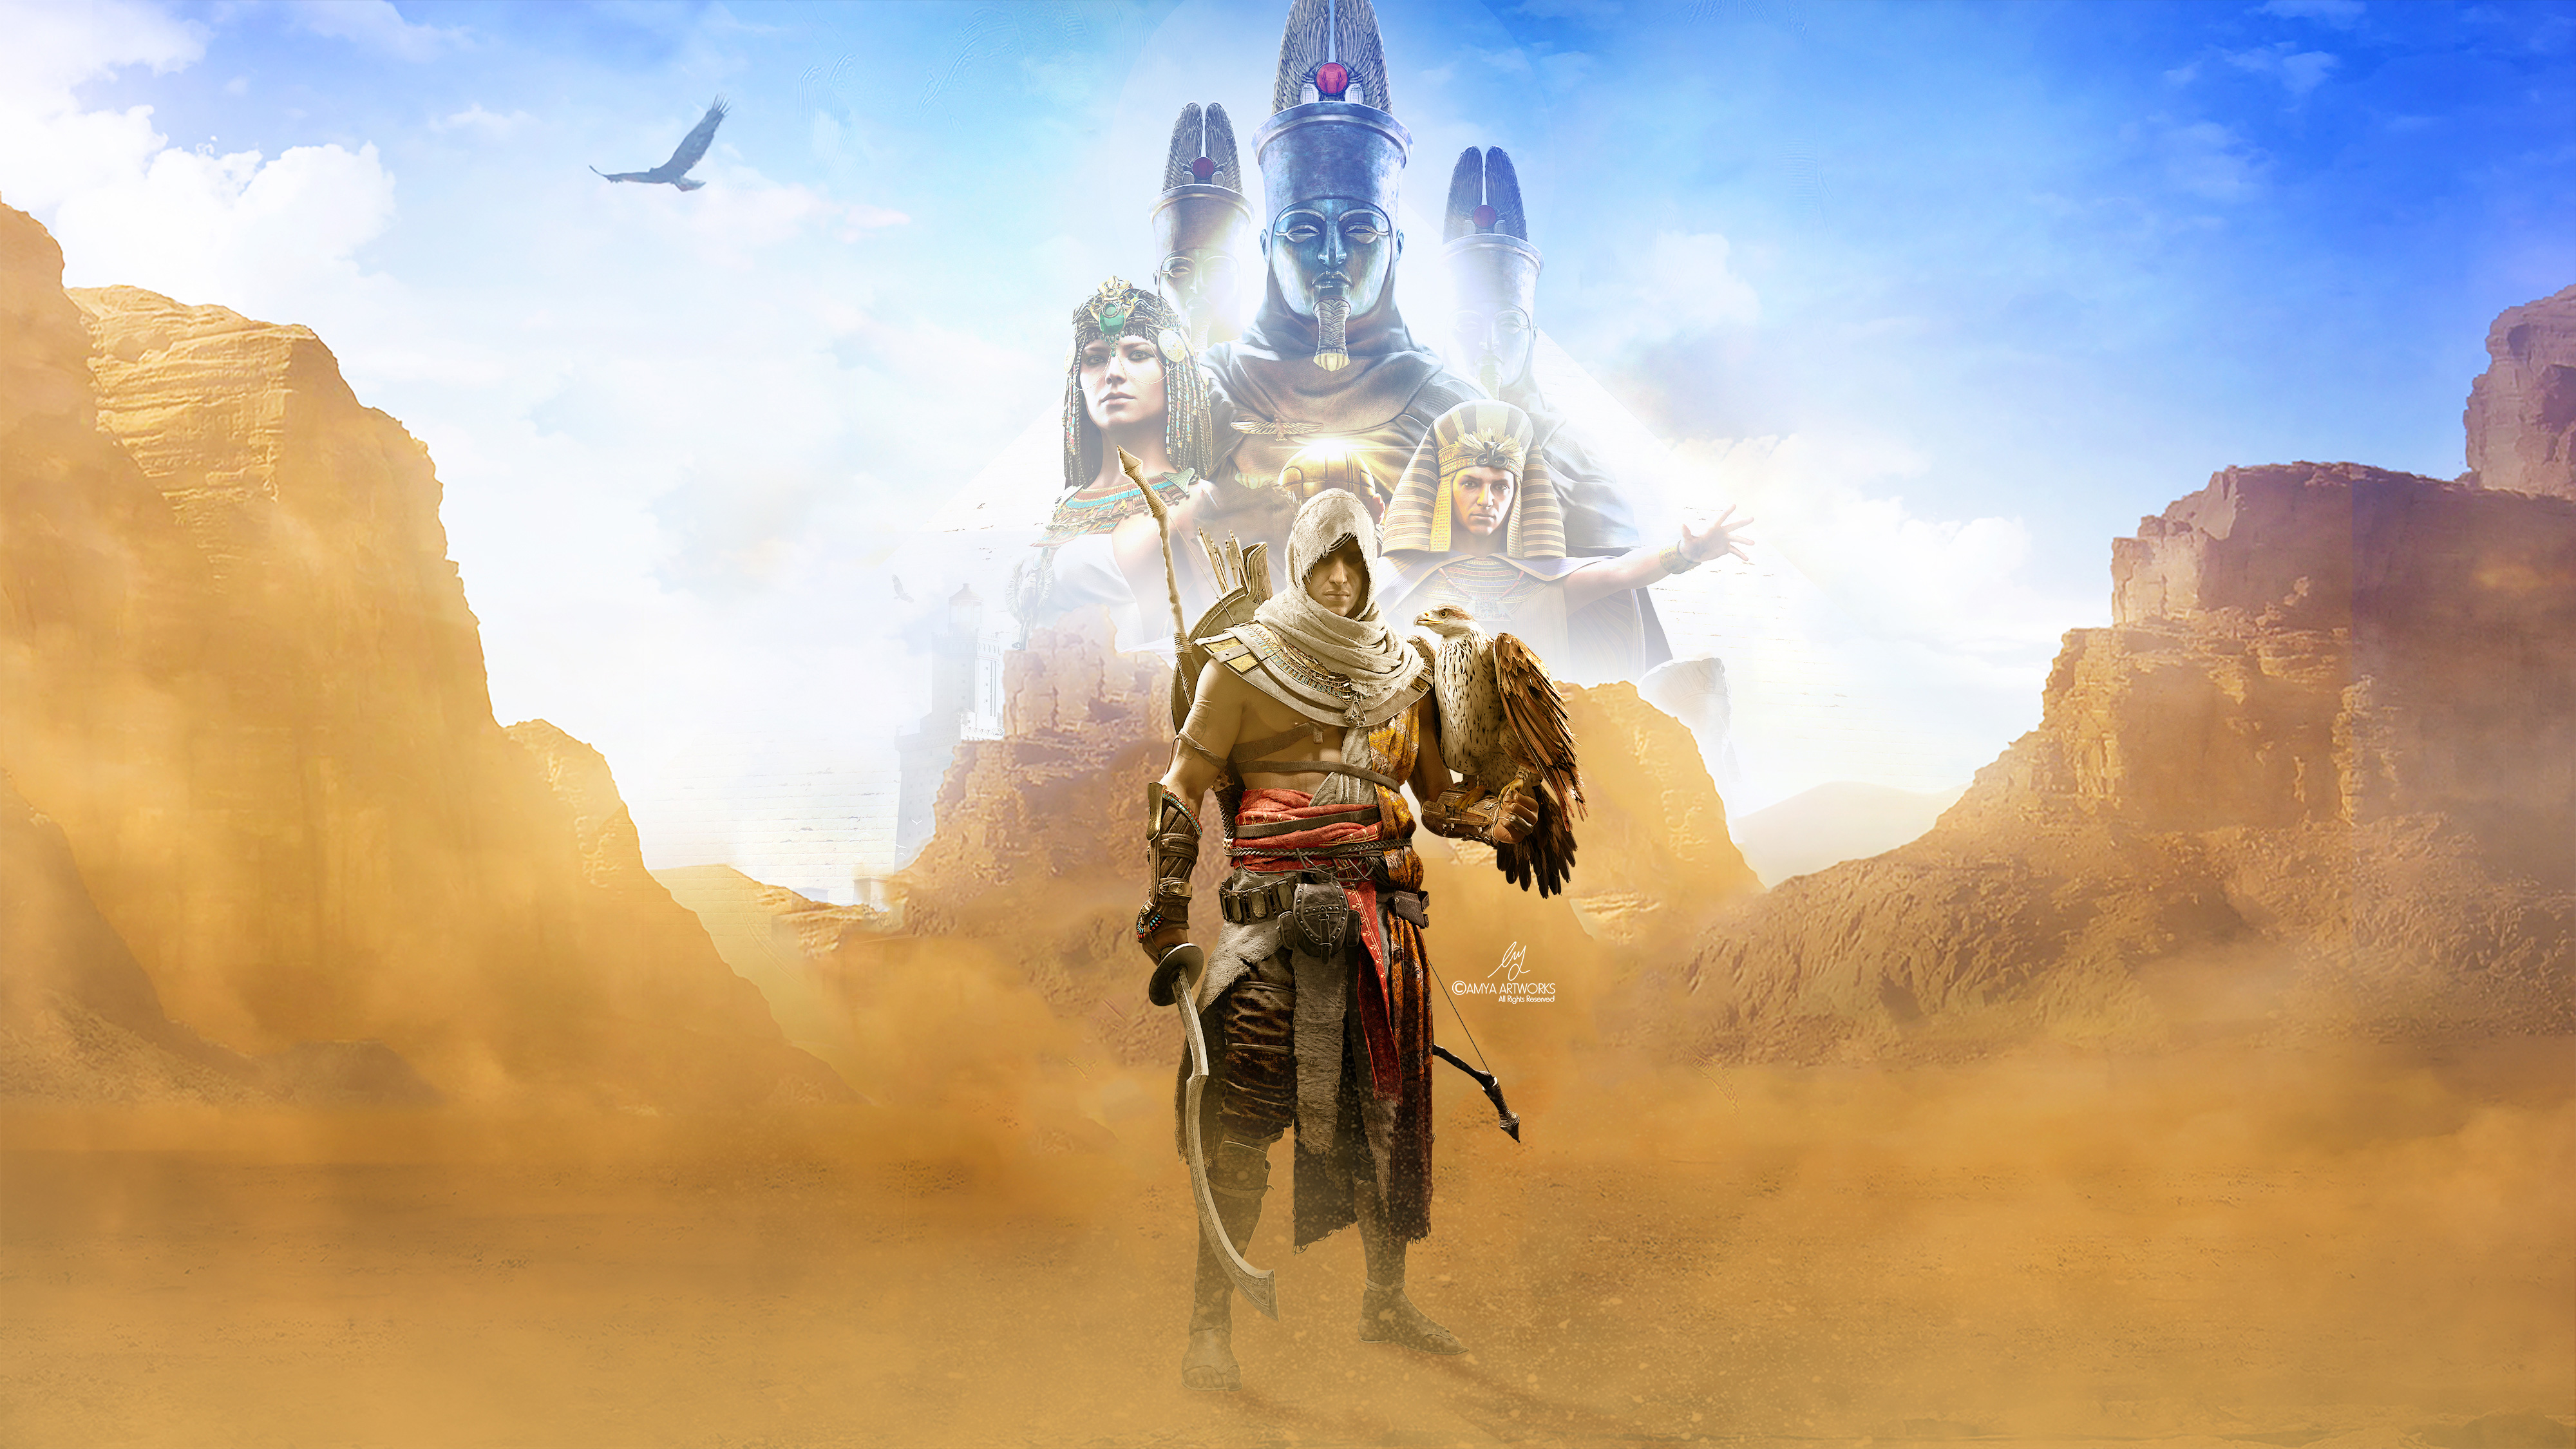 4k Assassins Creed Origins, HD Games, 4k Wallpapers ...